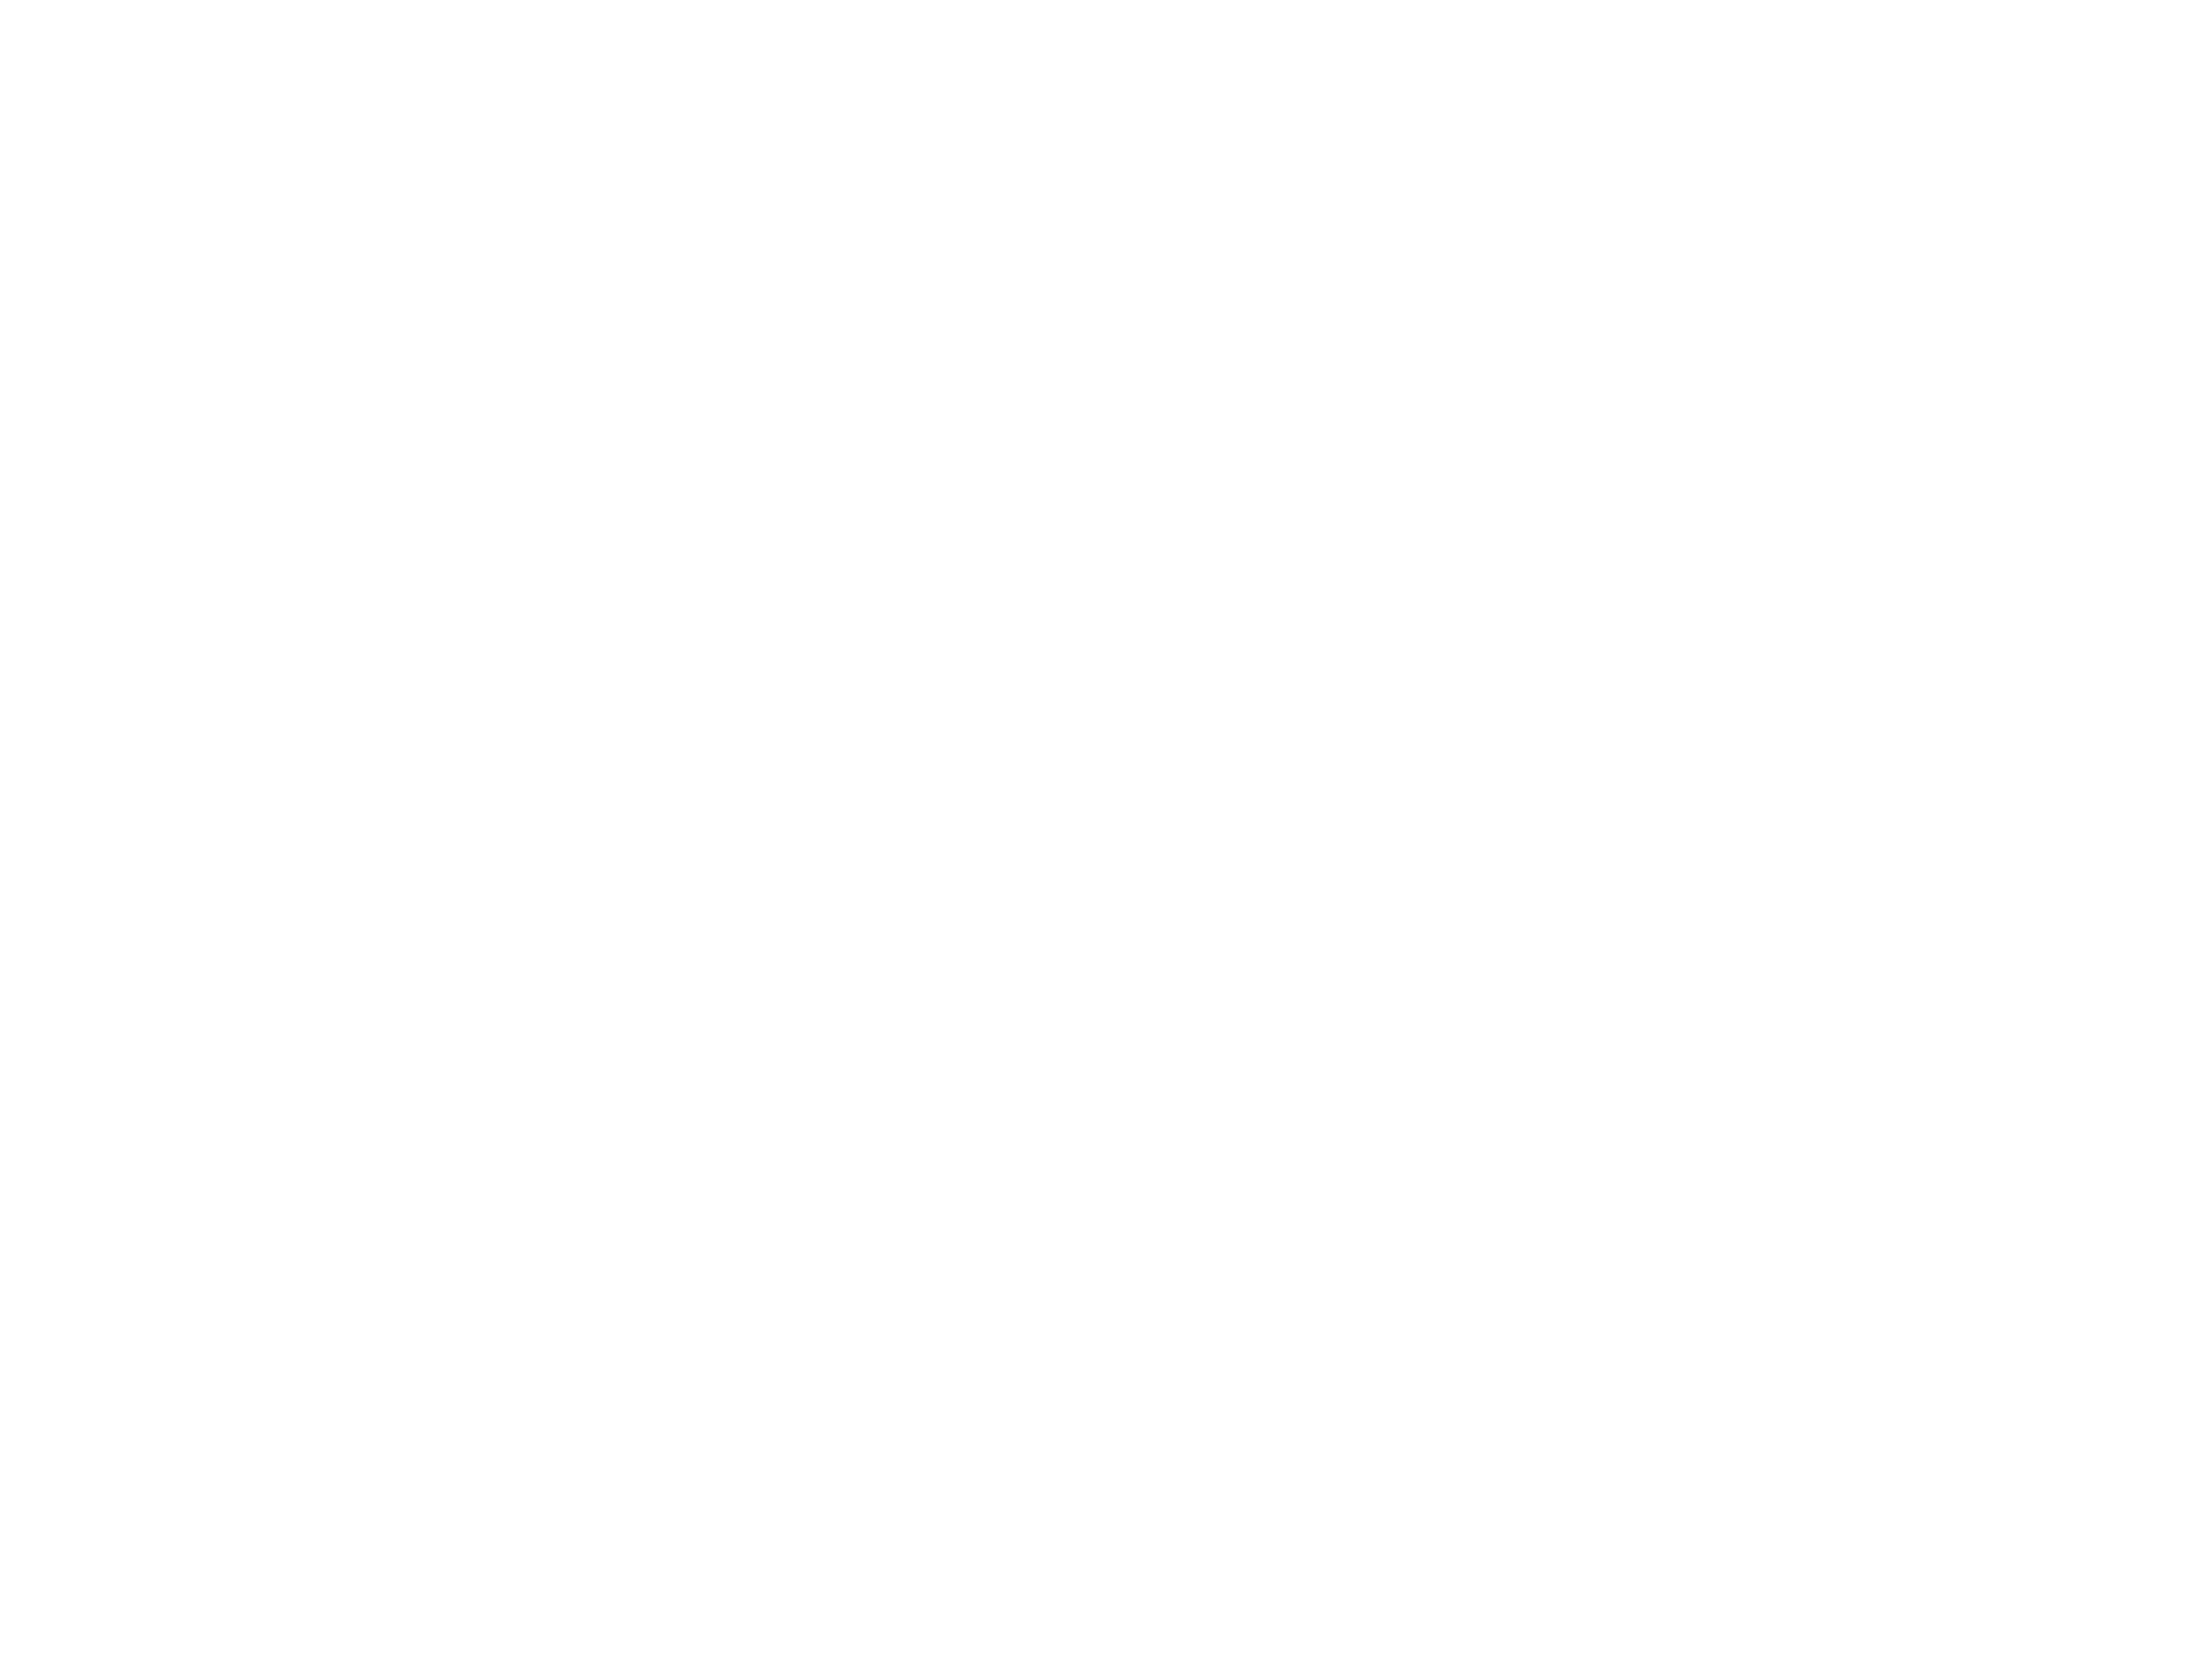 Kenneth Cabanilla